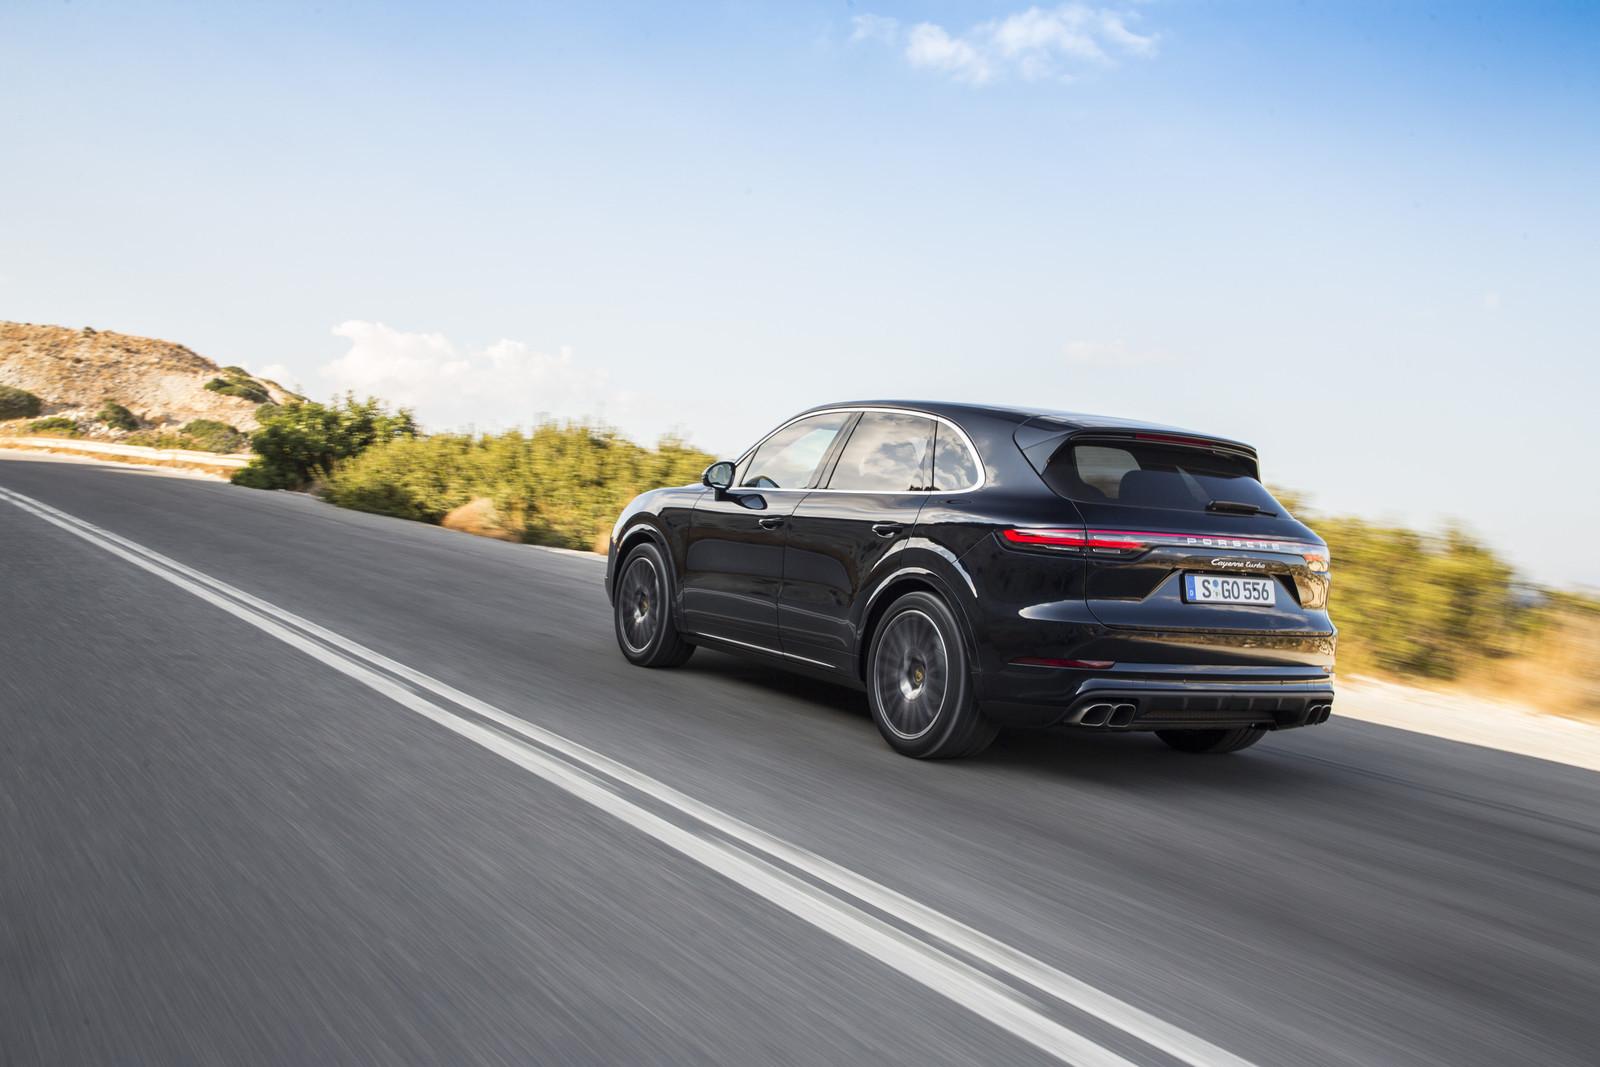 Foto de Porsche Cayenne Turbo 2018 (46/71)